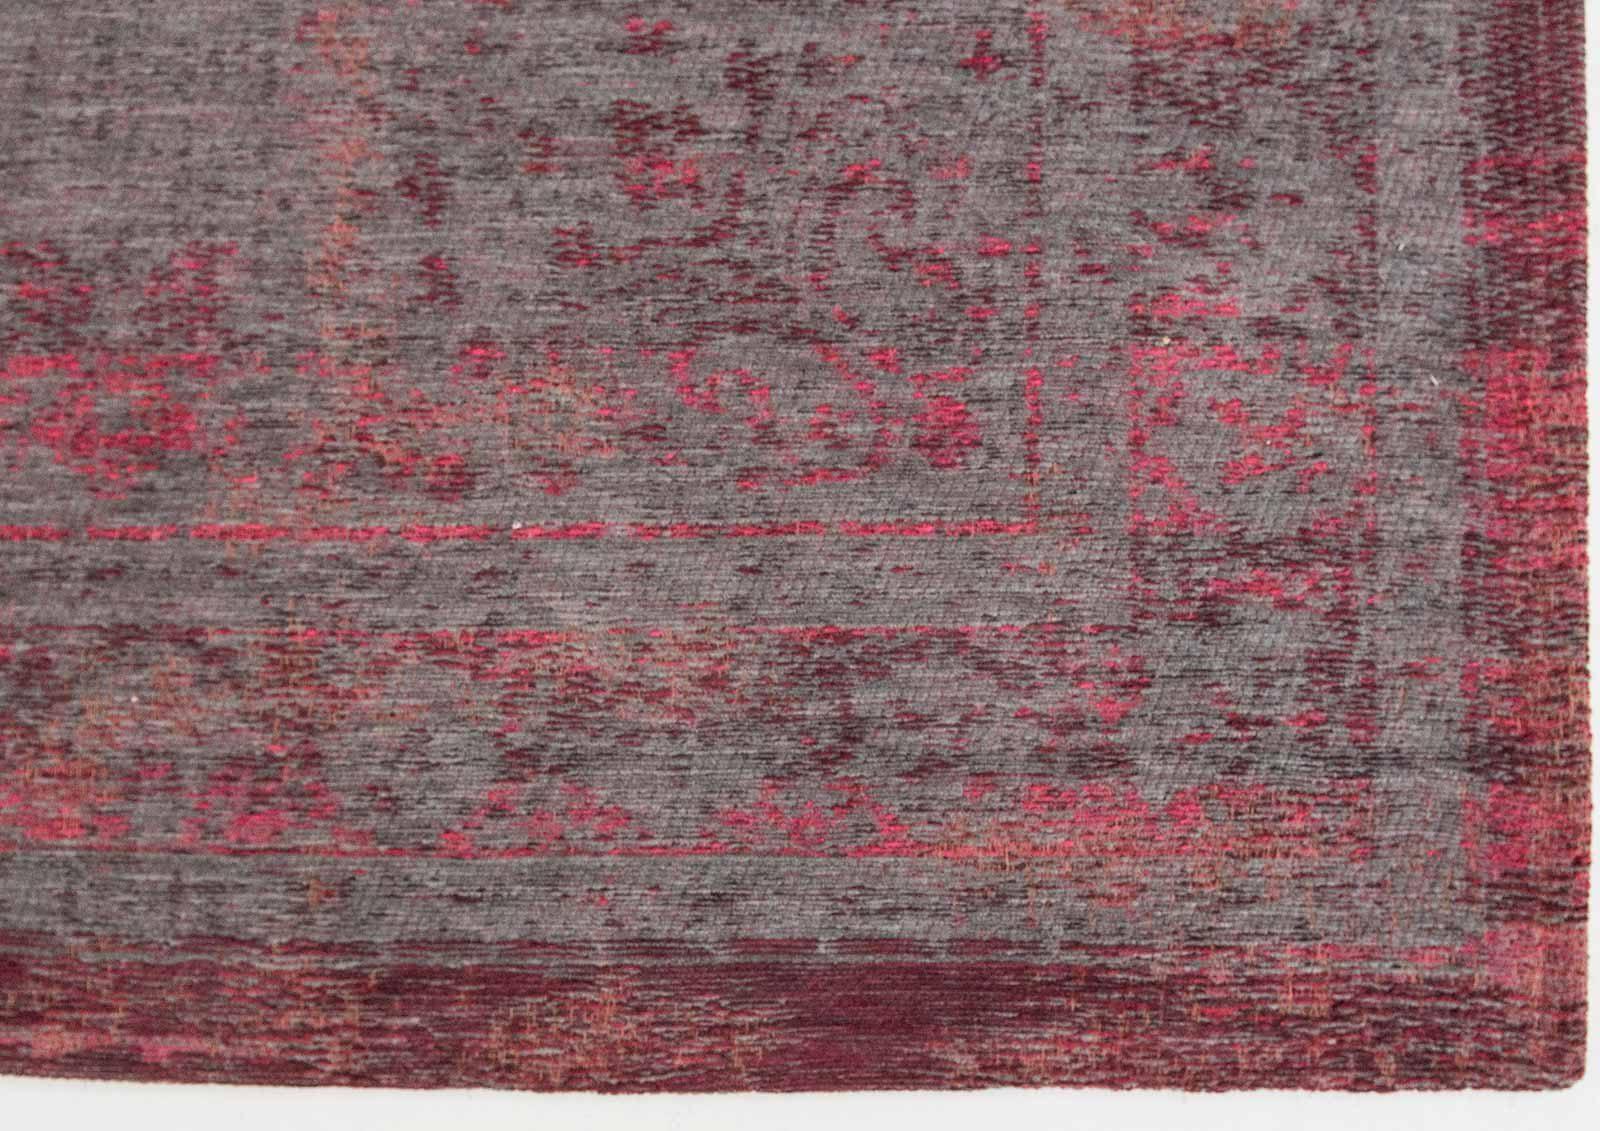 tapijt Louis De Poortere LX8261 Fading World Medaillon Pink Flash corner